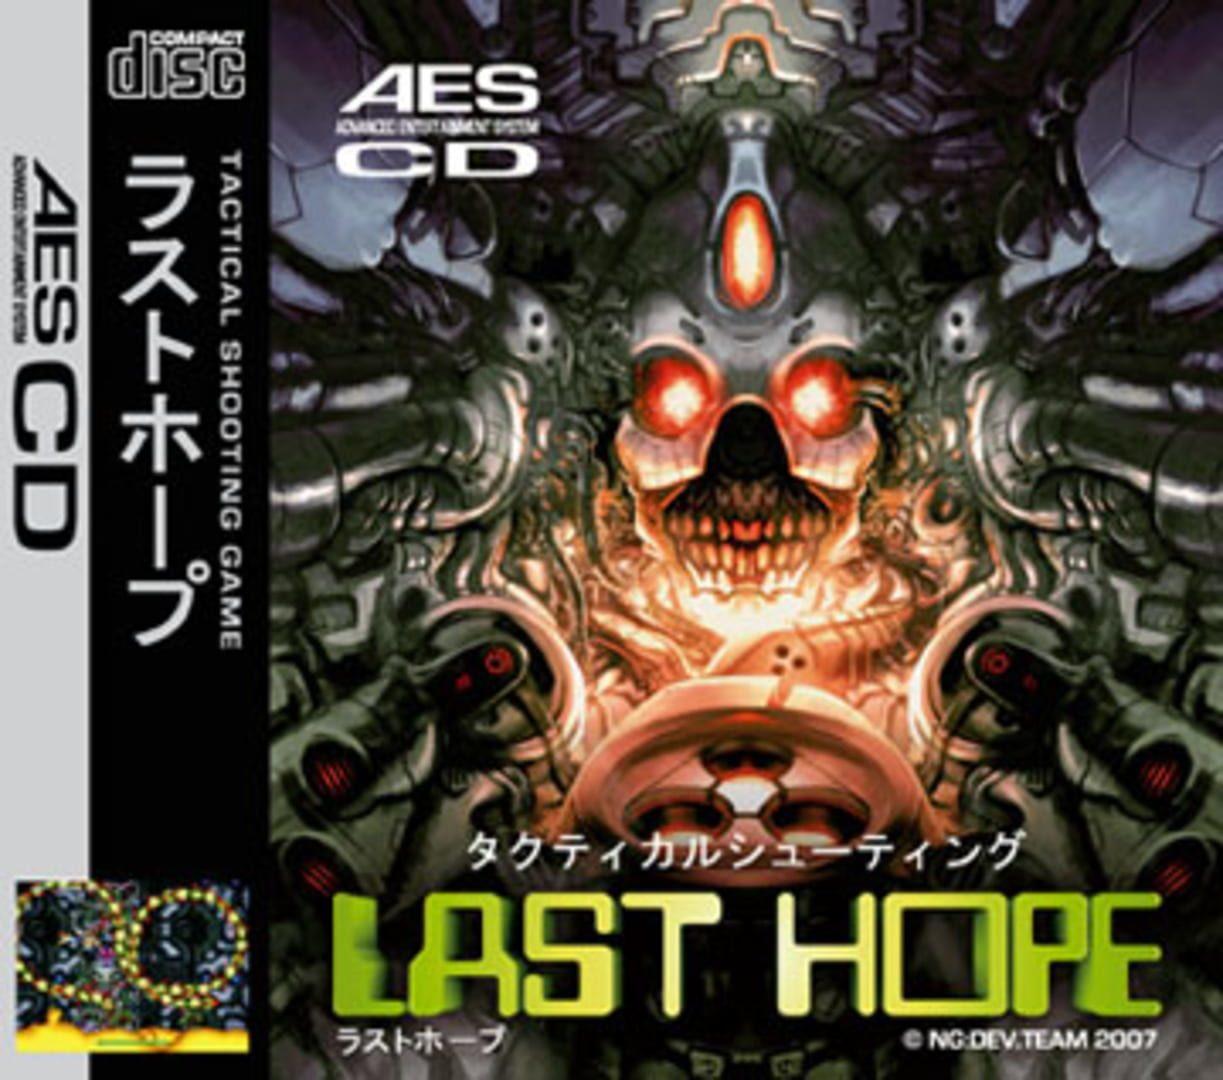 buy Last Hope cd key for all platform